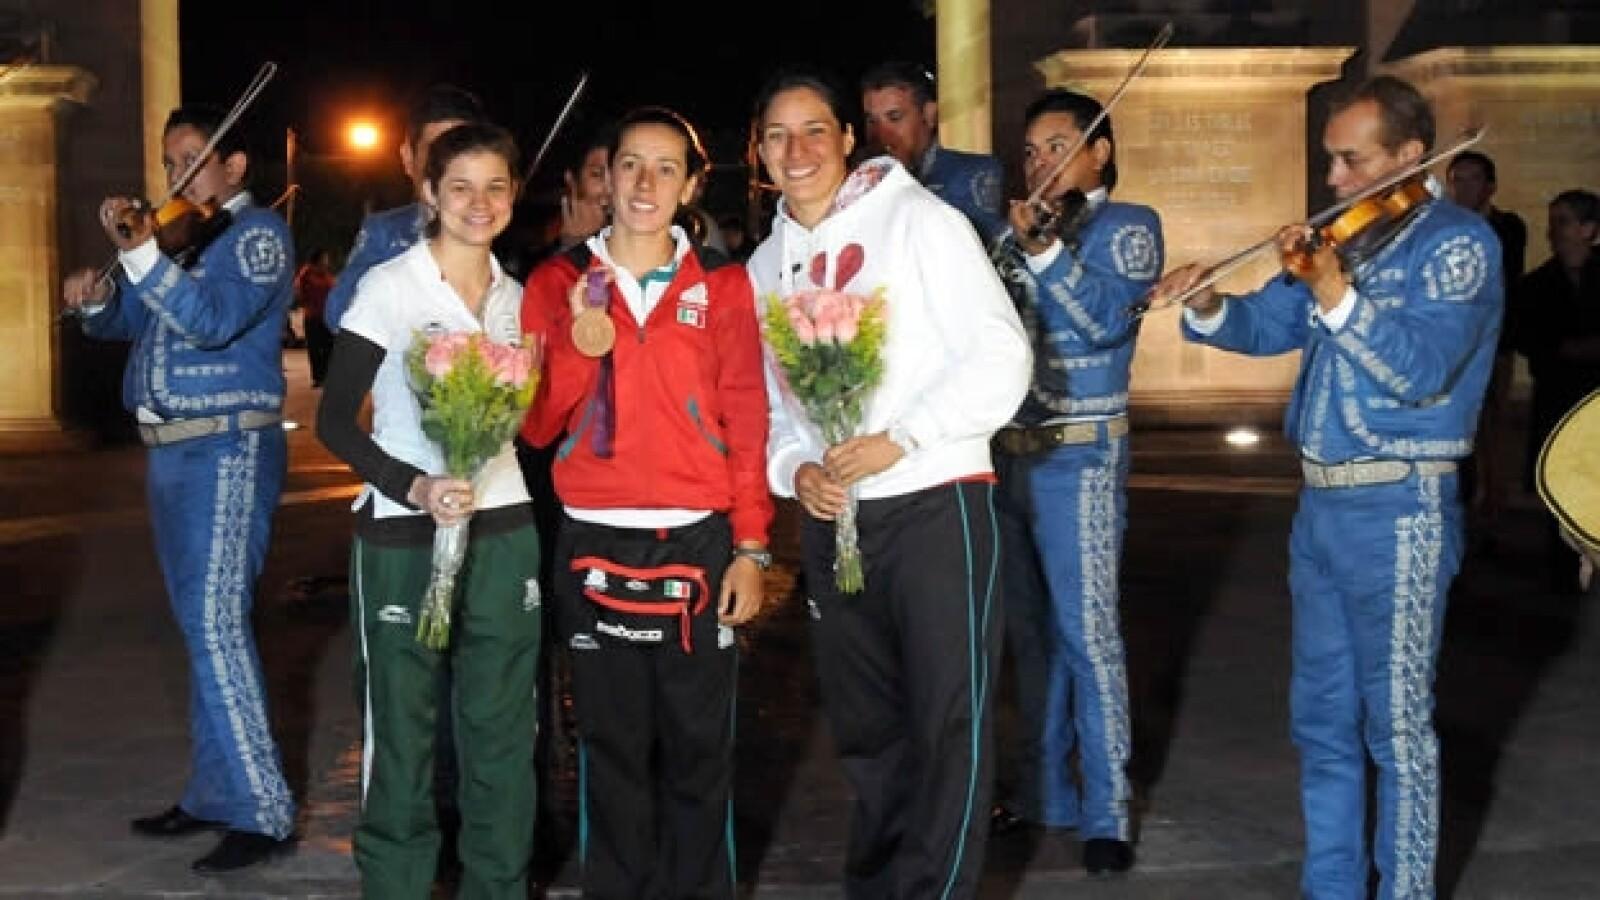 medallista, guanajuato, marichi